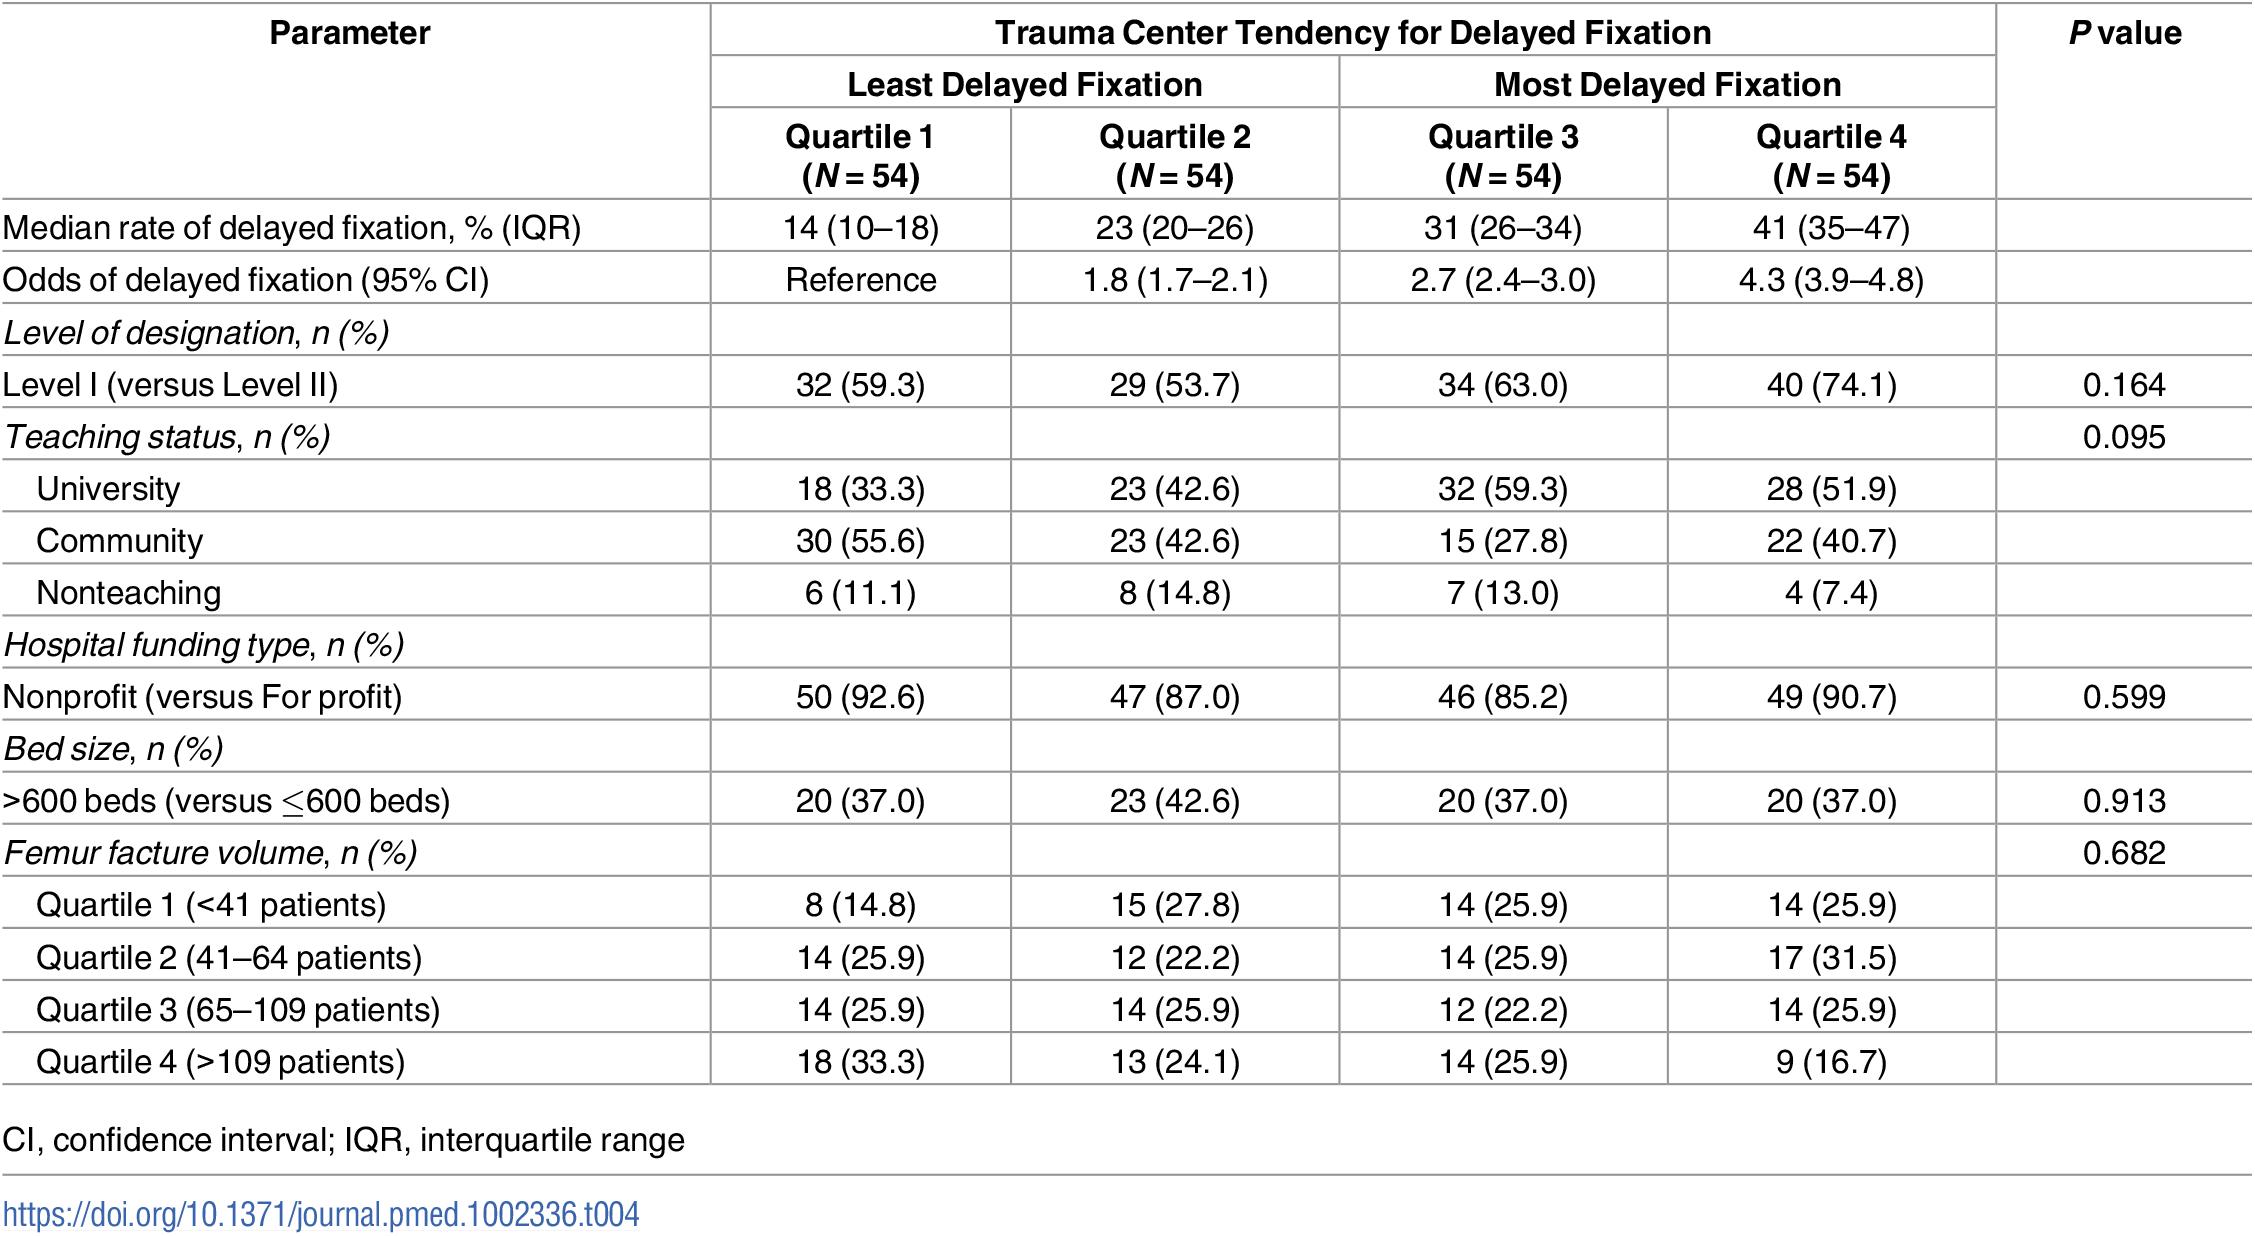 Trauma center characteristics by hospital quartile of delayed fixation.